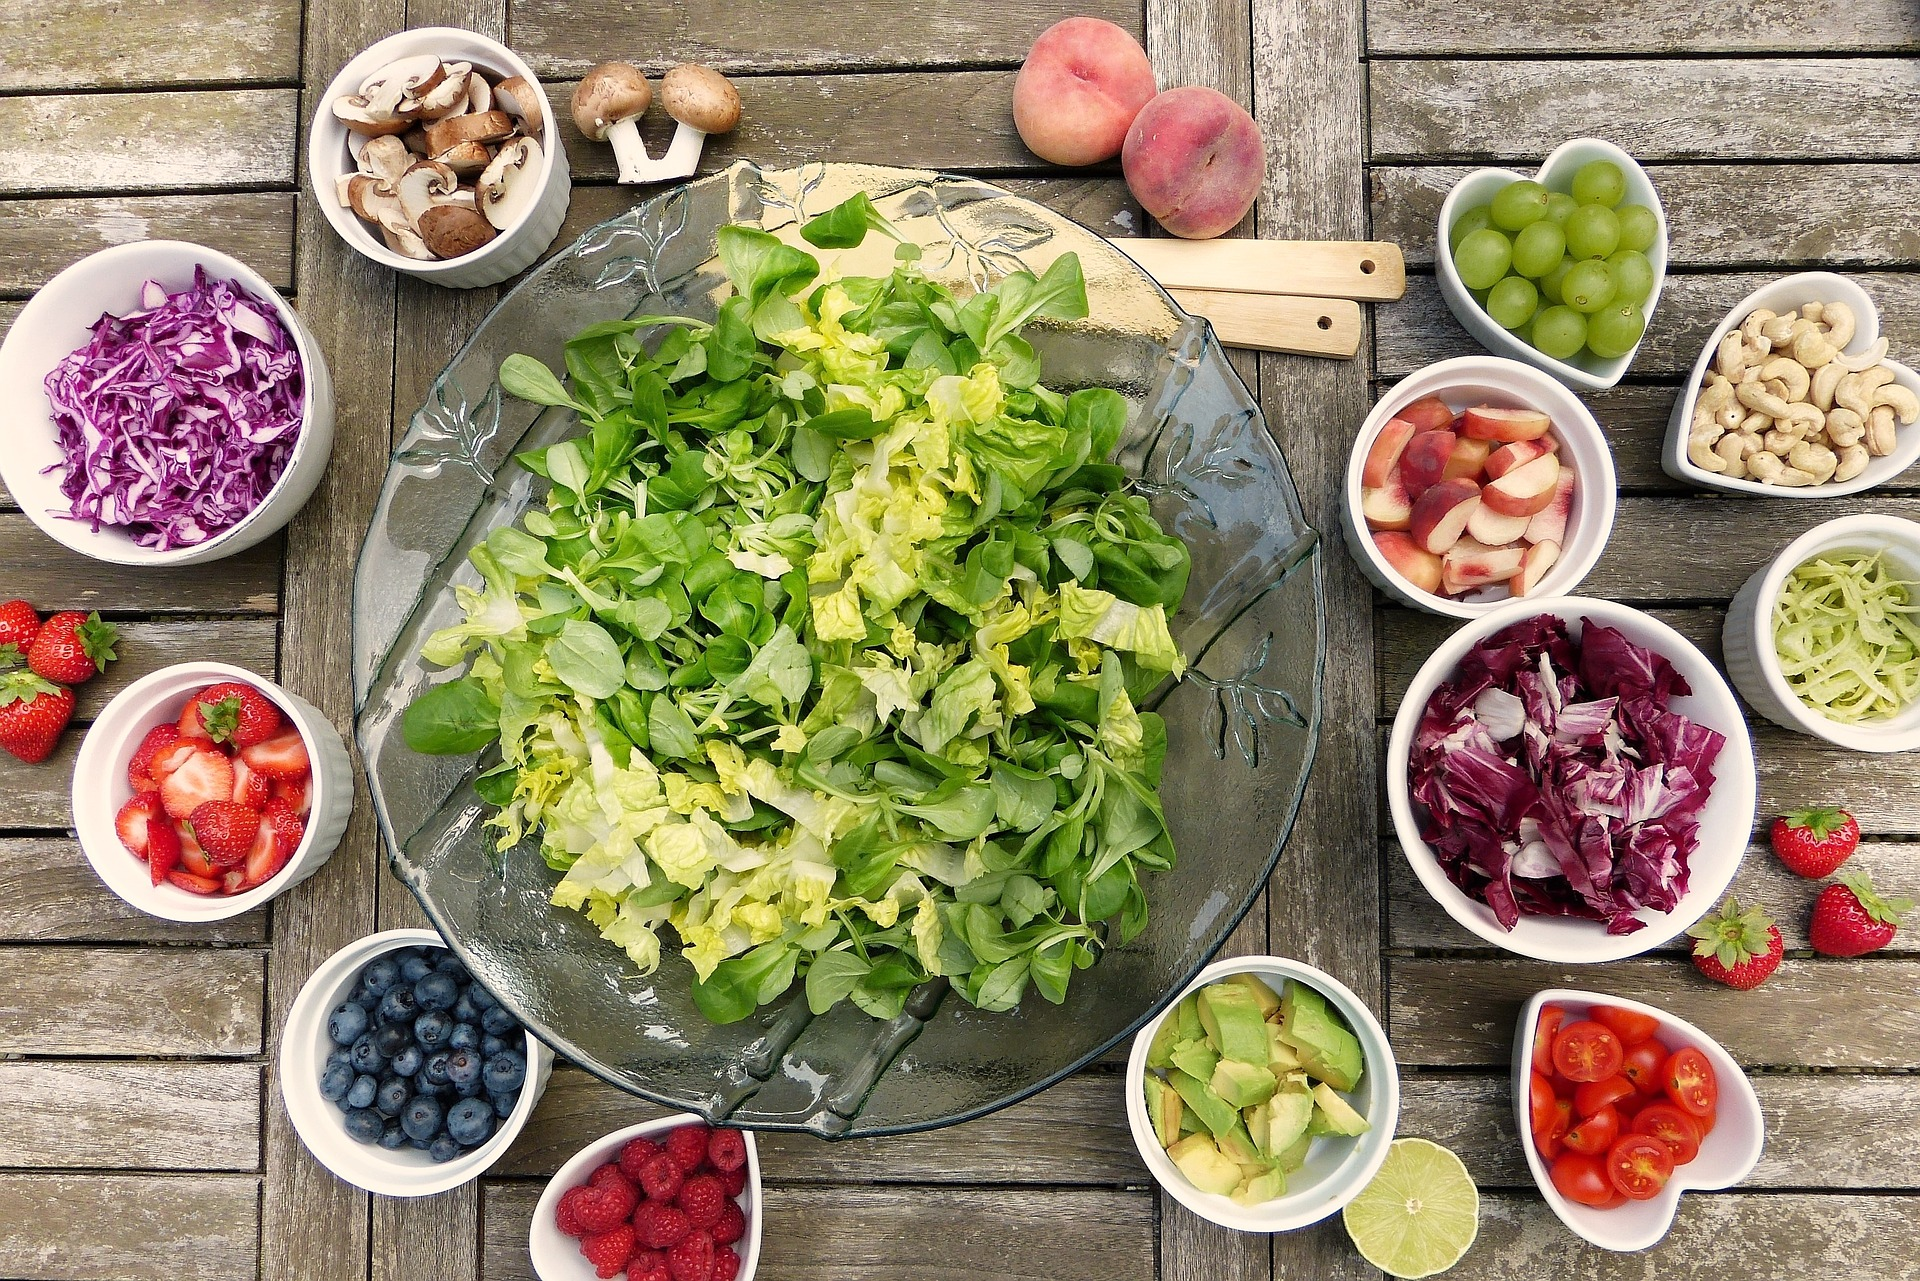 Les cinq fruits et légumes conseillés par le PNNS (c) Silviarita, Pixabay